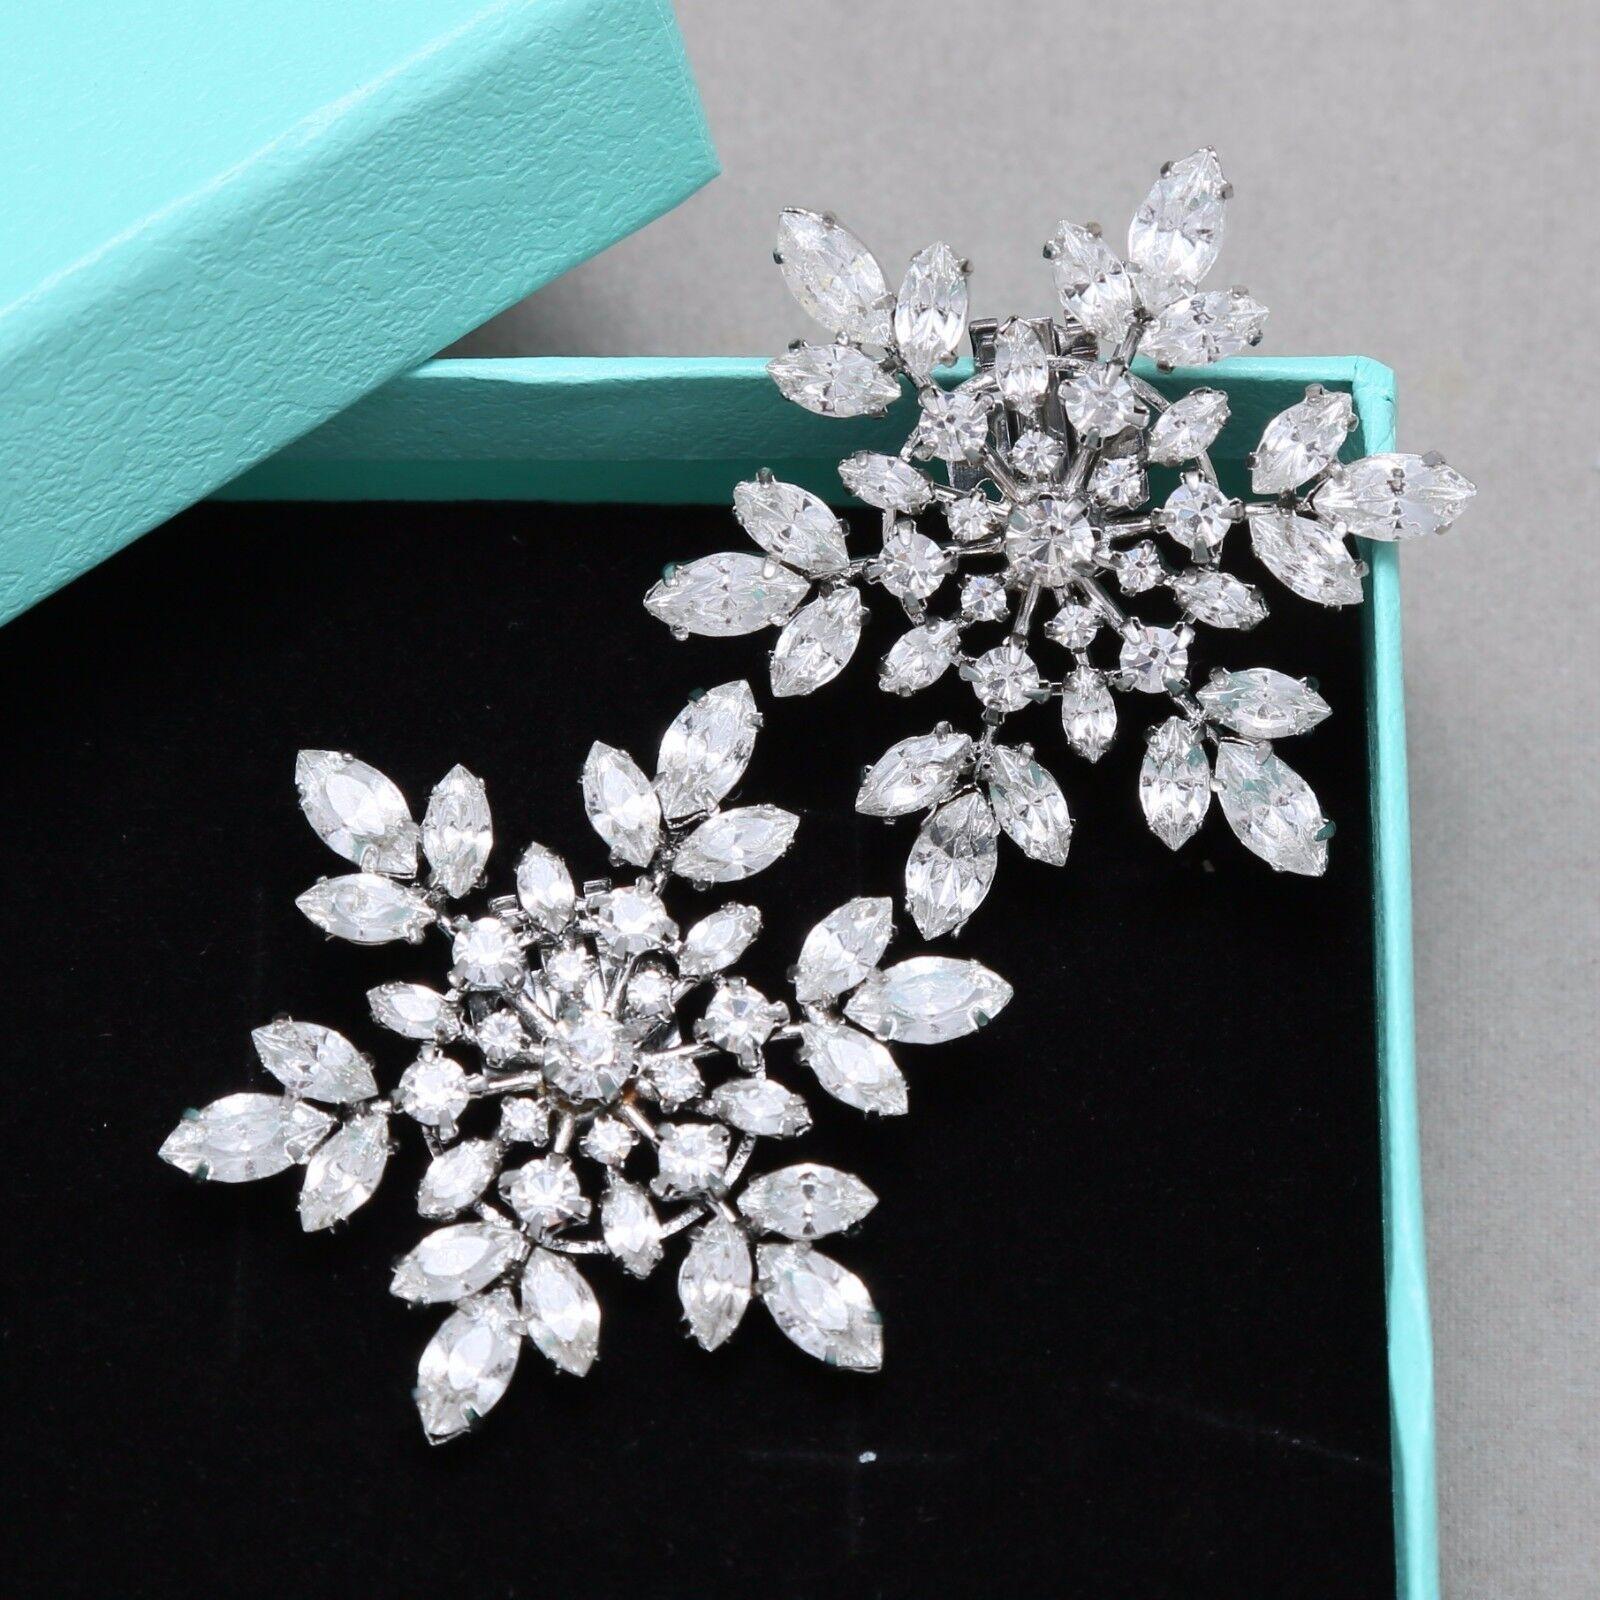 Snowflake Diamante Rhinestone Bridal High Heel Boots Shoe Clips Decoration Pair